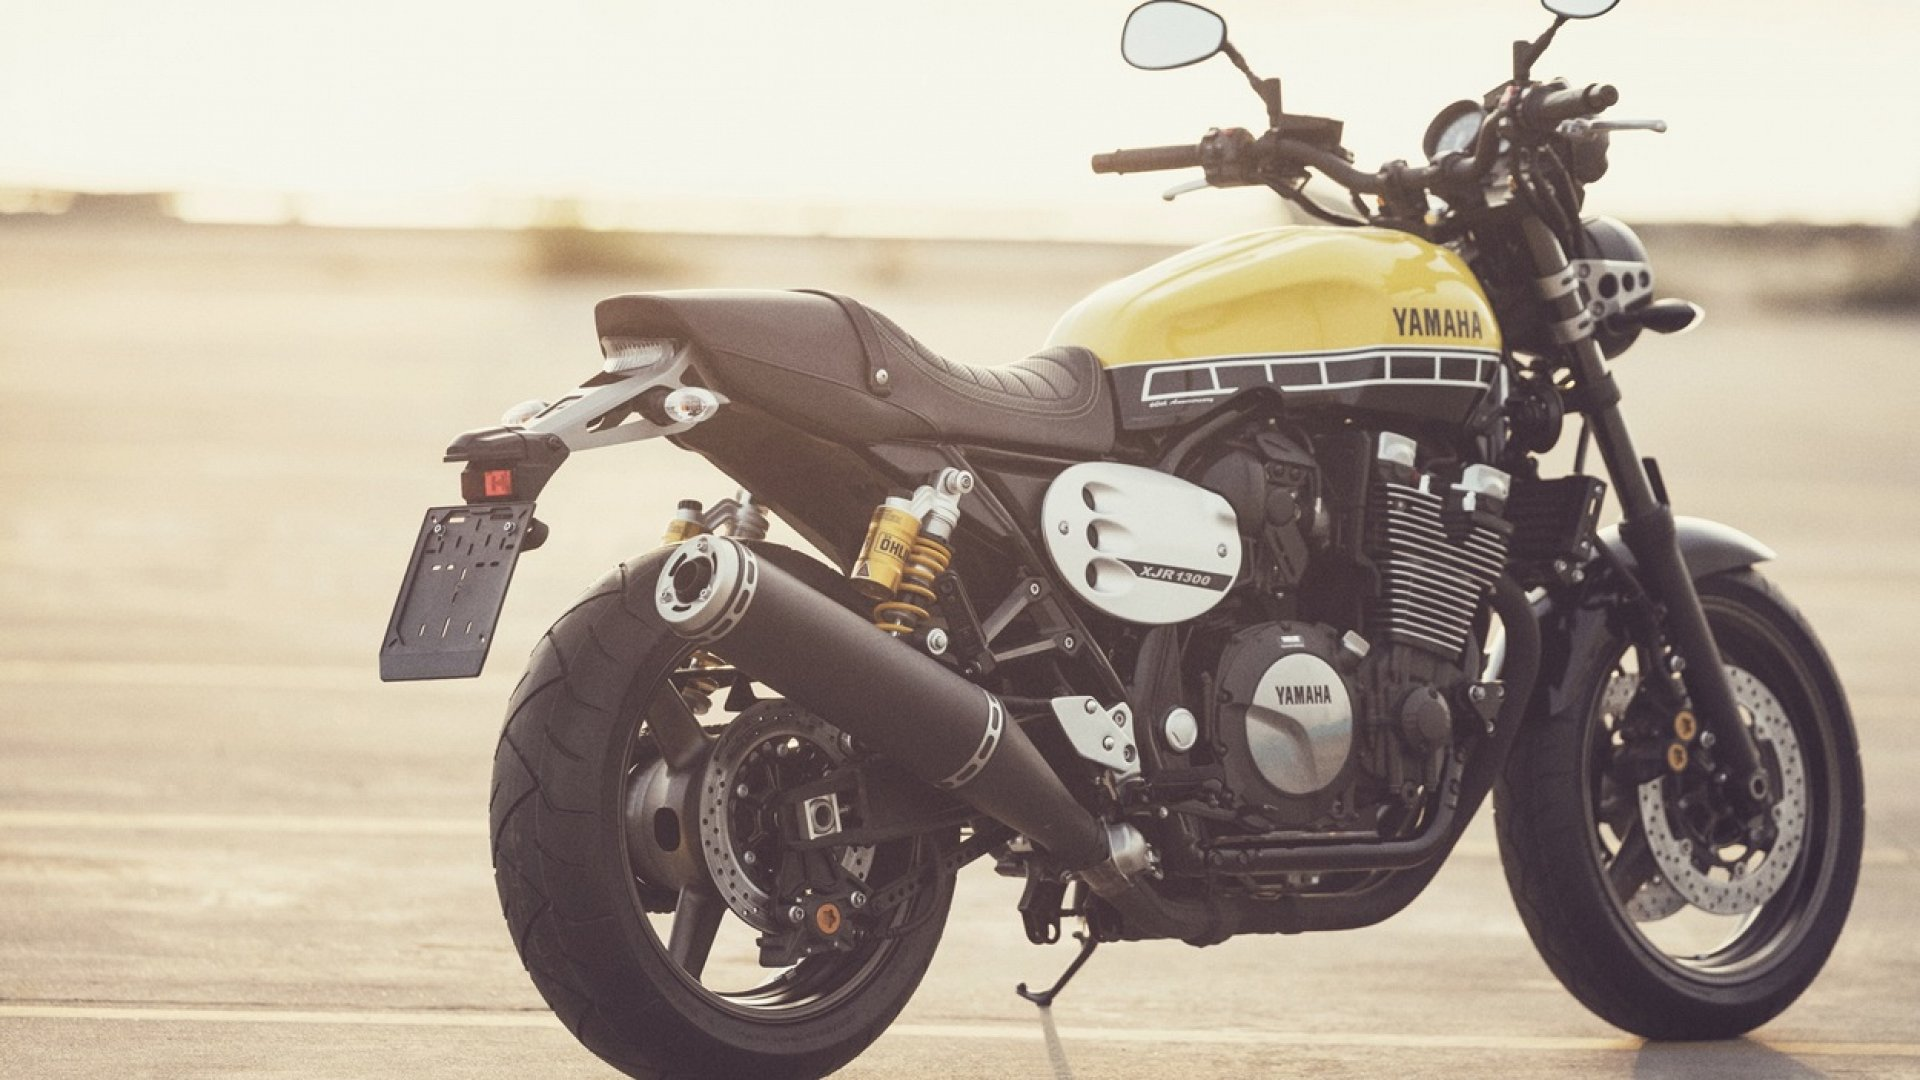 New 2016 yamaha xjr1300 for sale finance available and for Yamaha motor finance usa